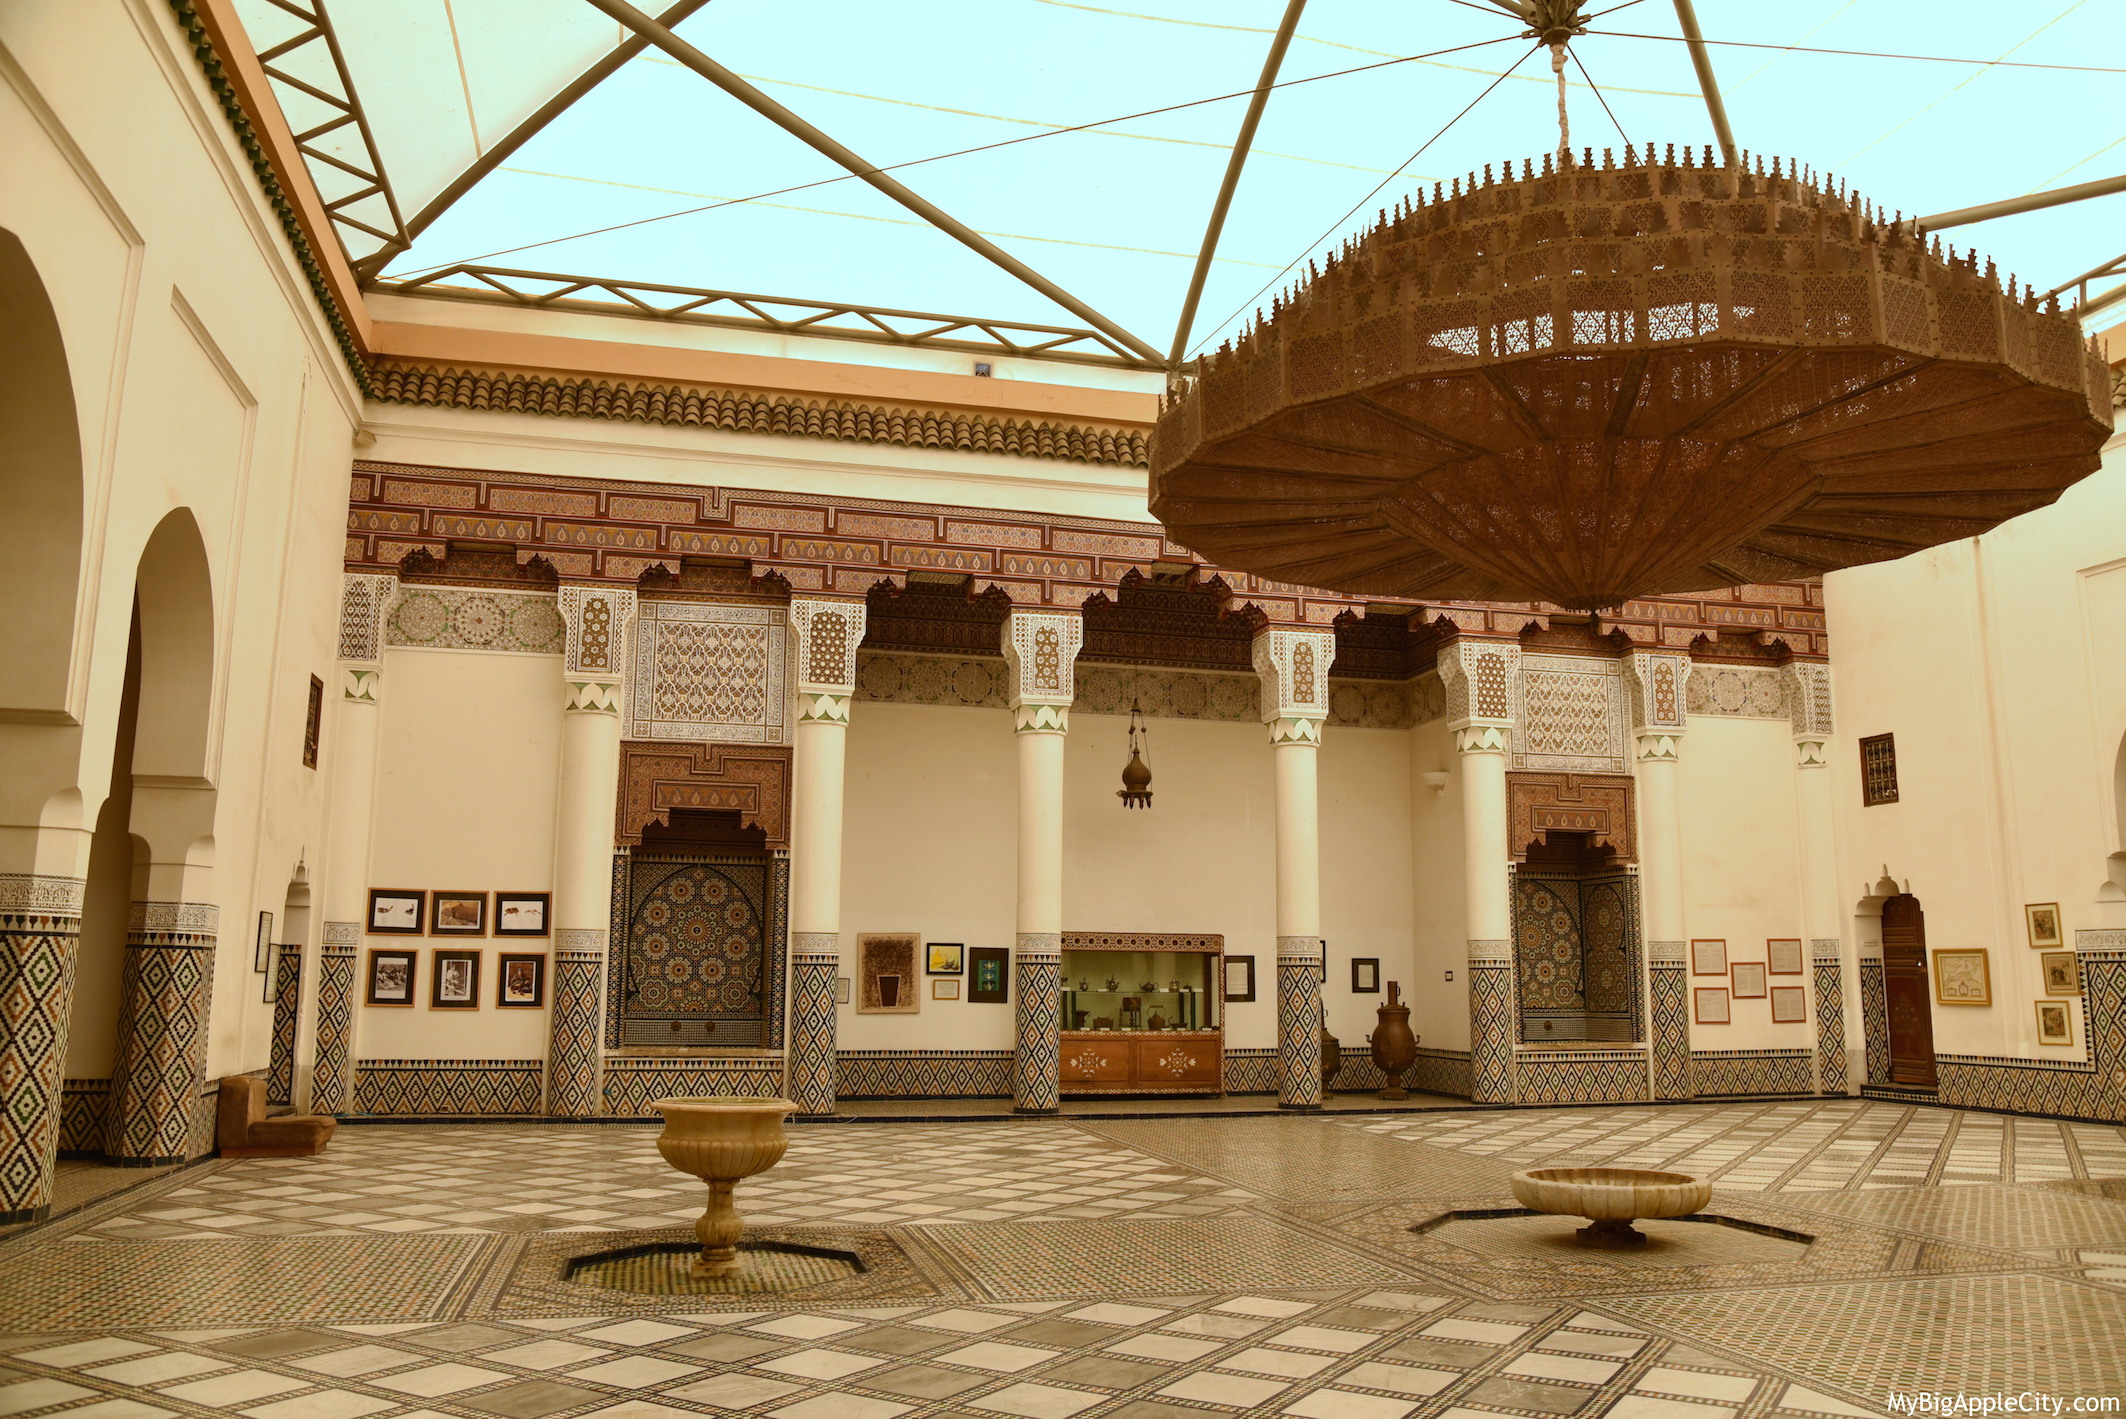 Palais-Marrakech-blogueuse-voyage-2016-MyBigAppleCity